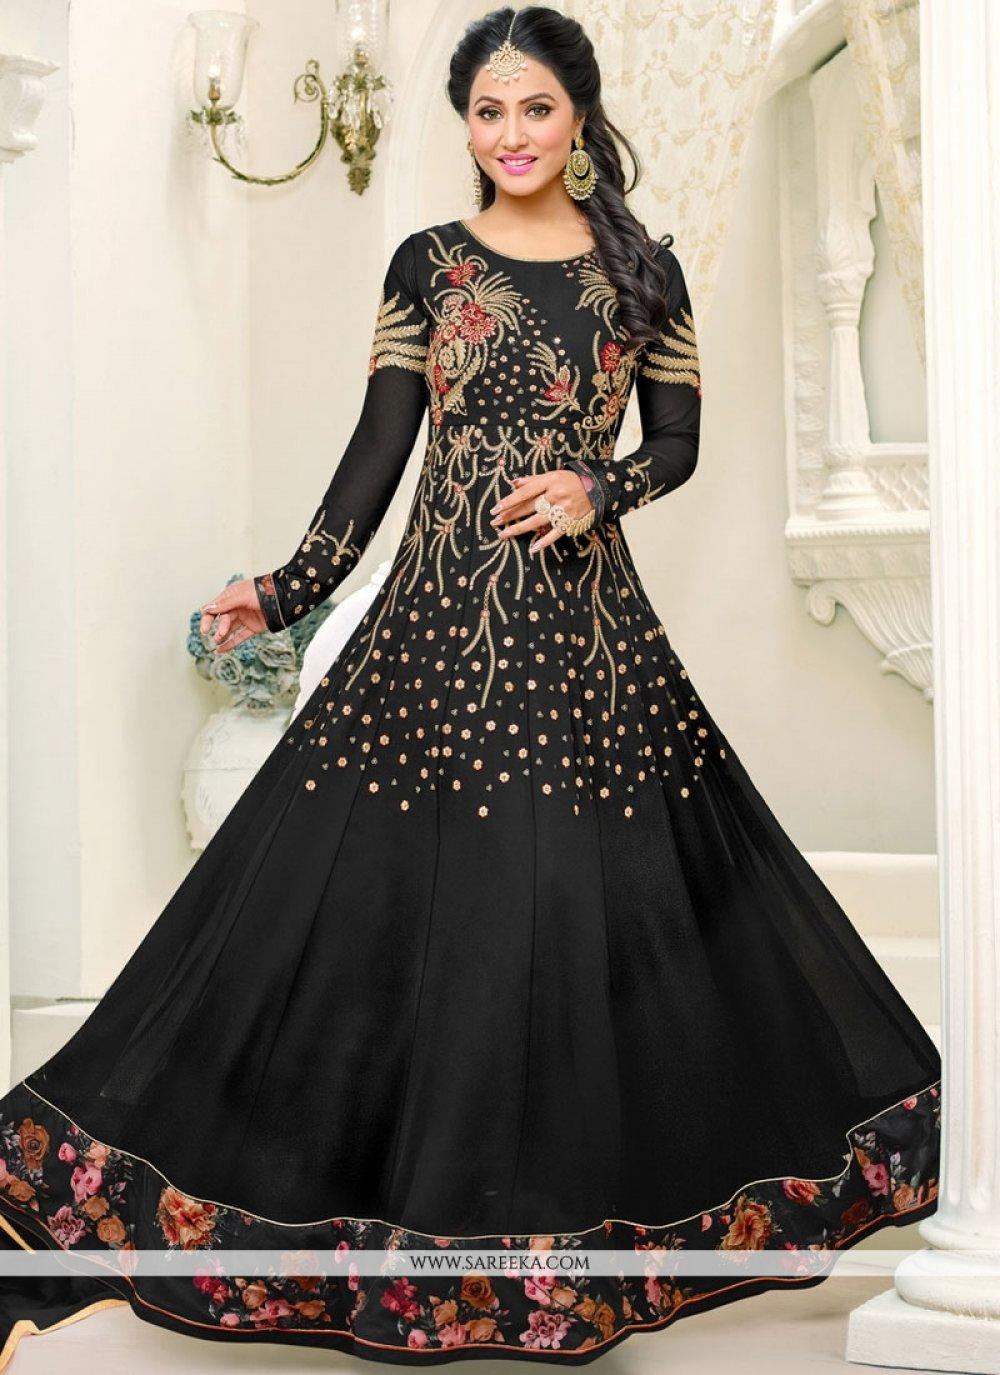 Hina Khan Resham Work Floor Length Anarkali Suit